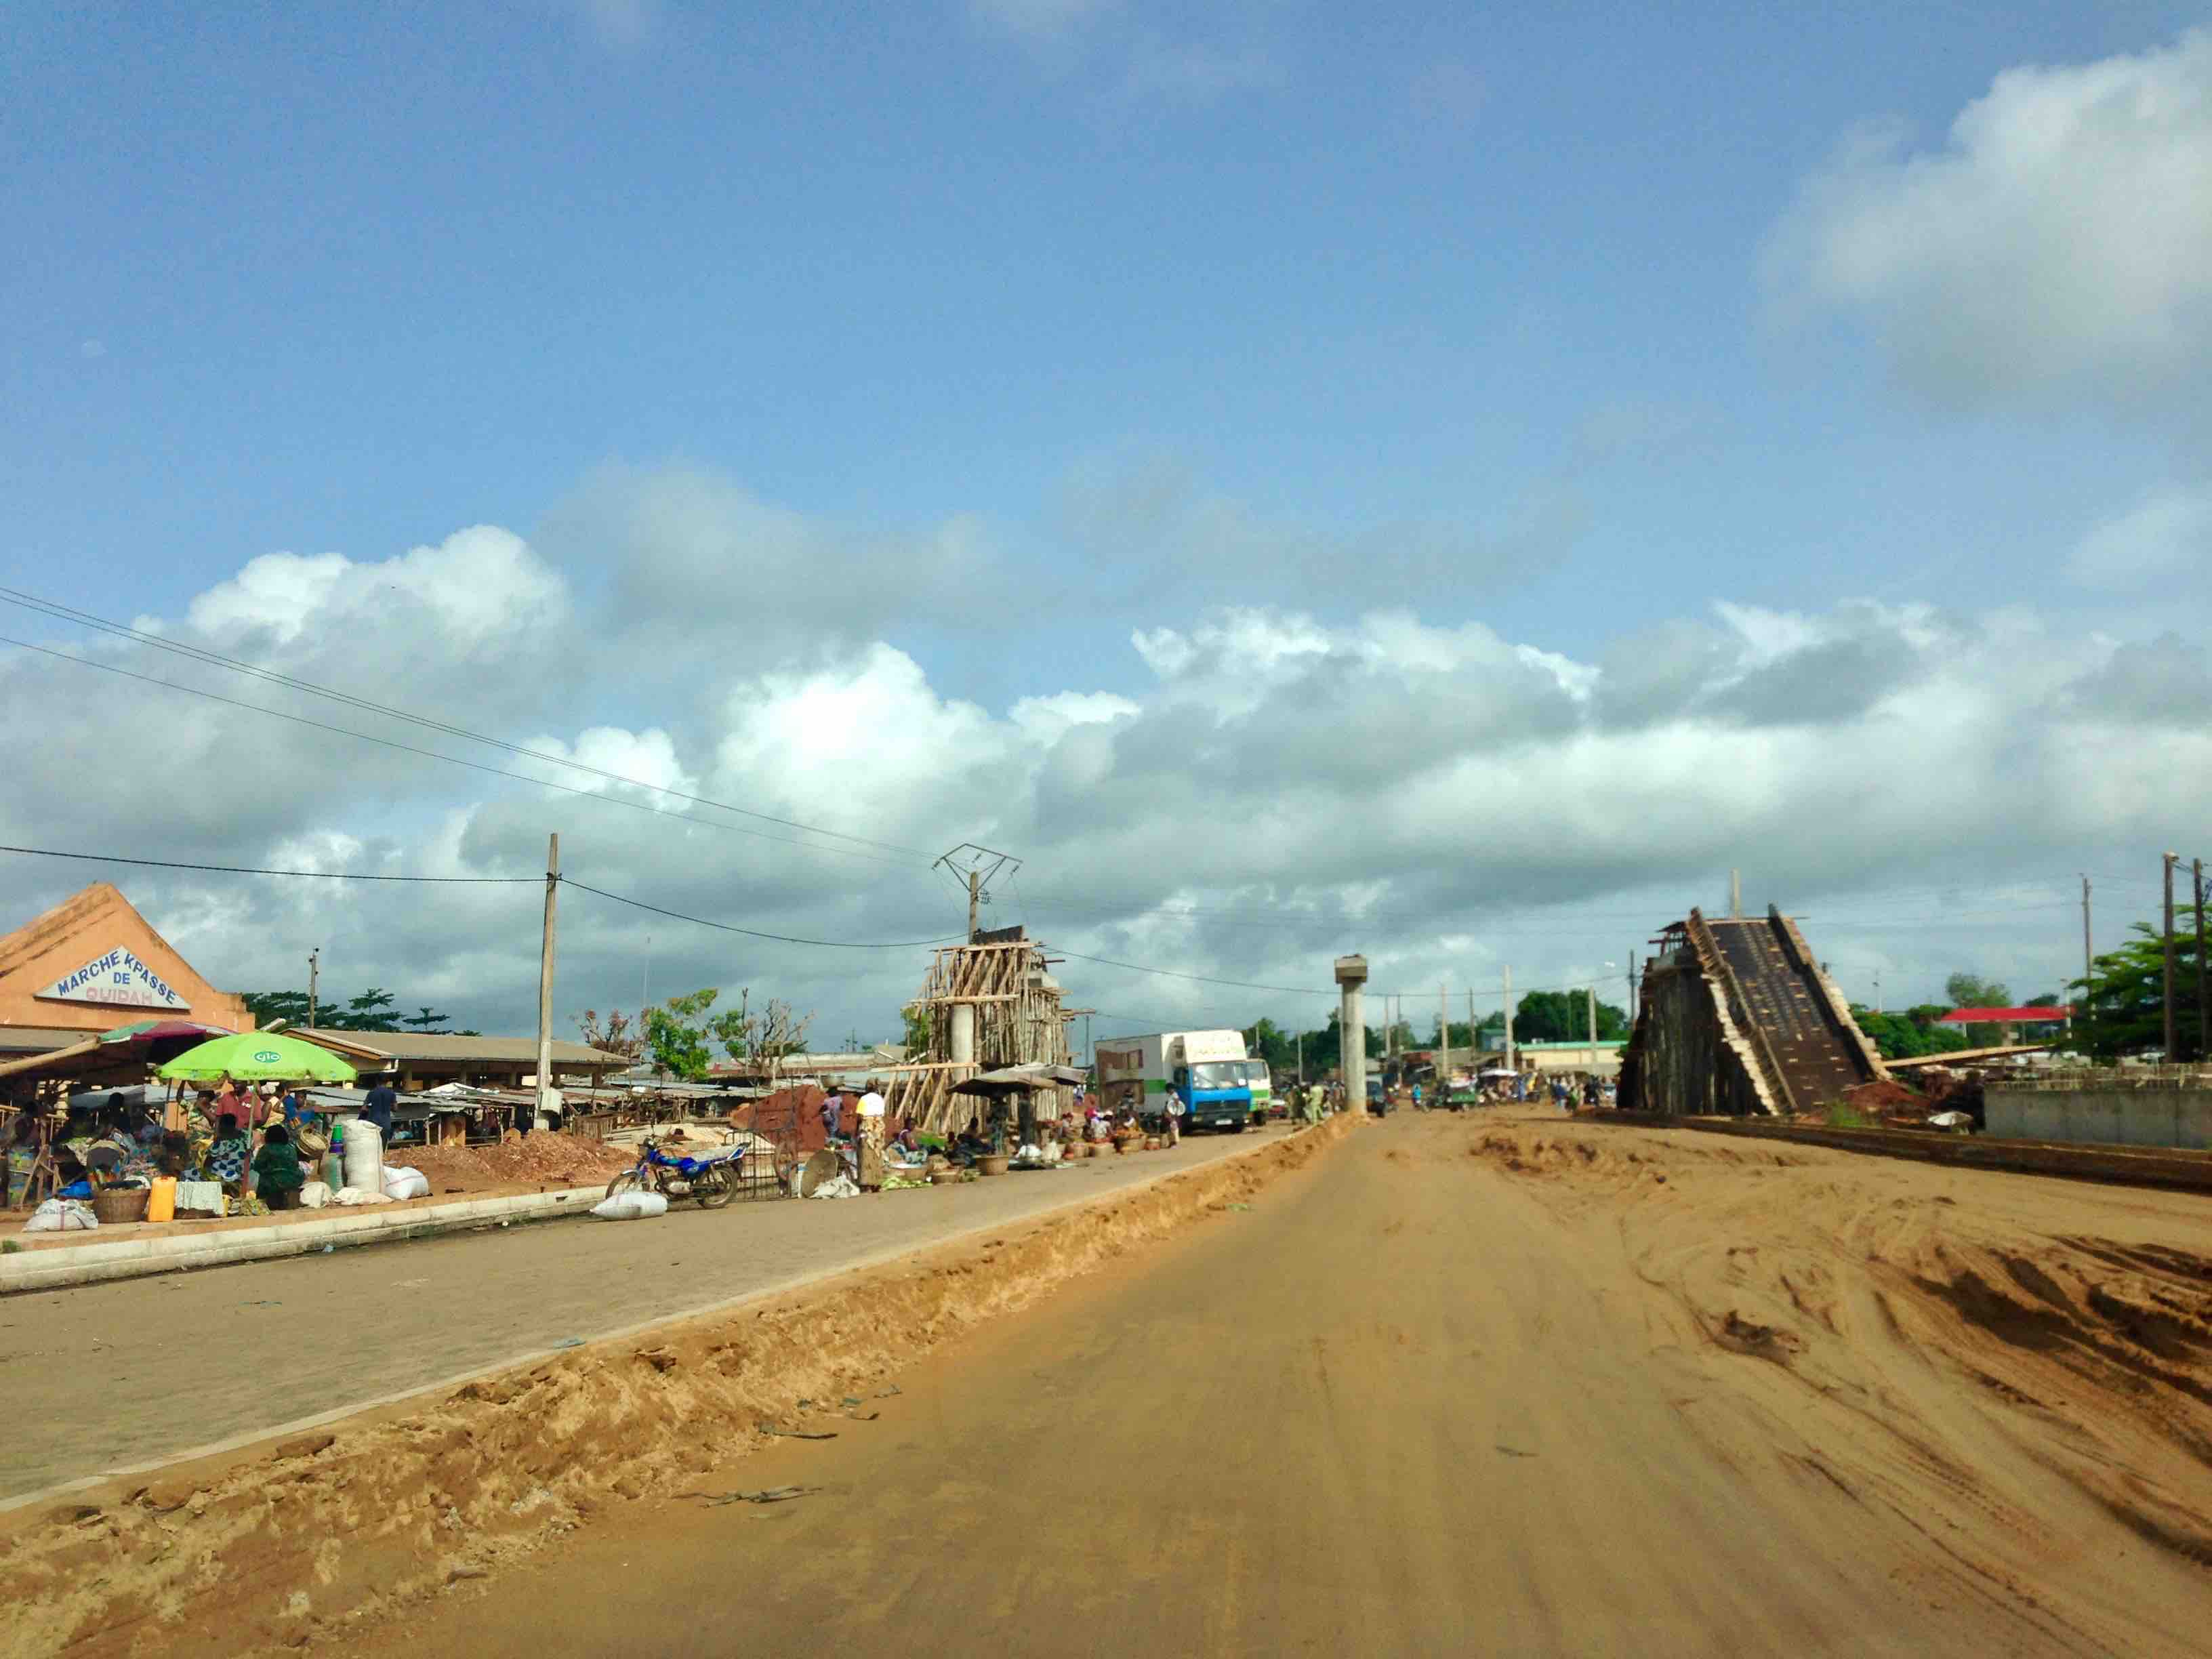 Quidah, Atlantique, Benin. #JujuFilms